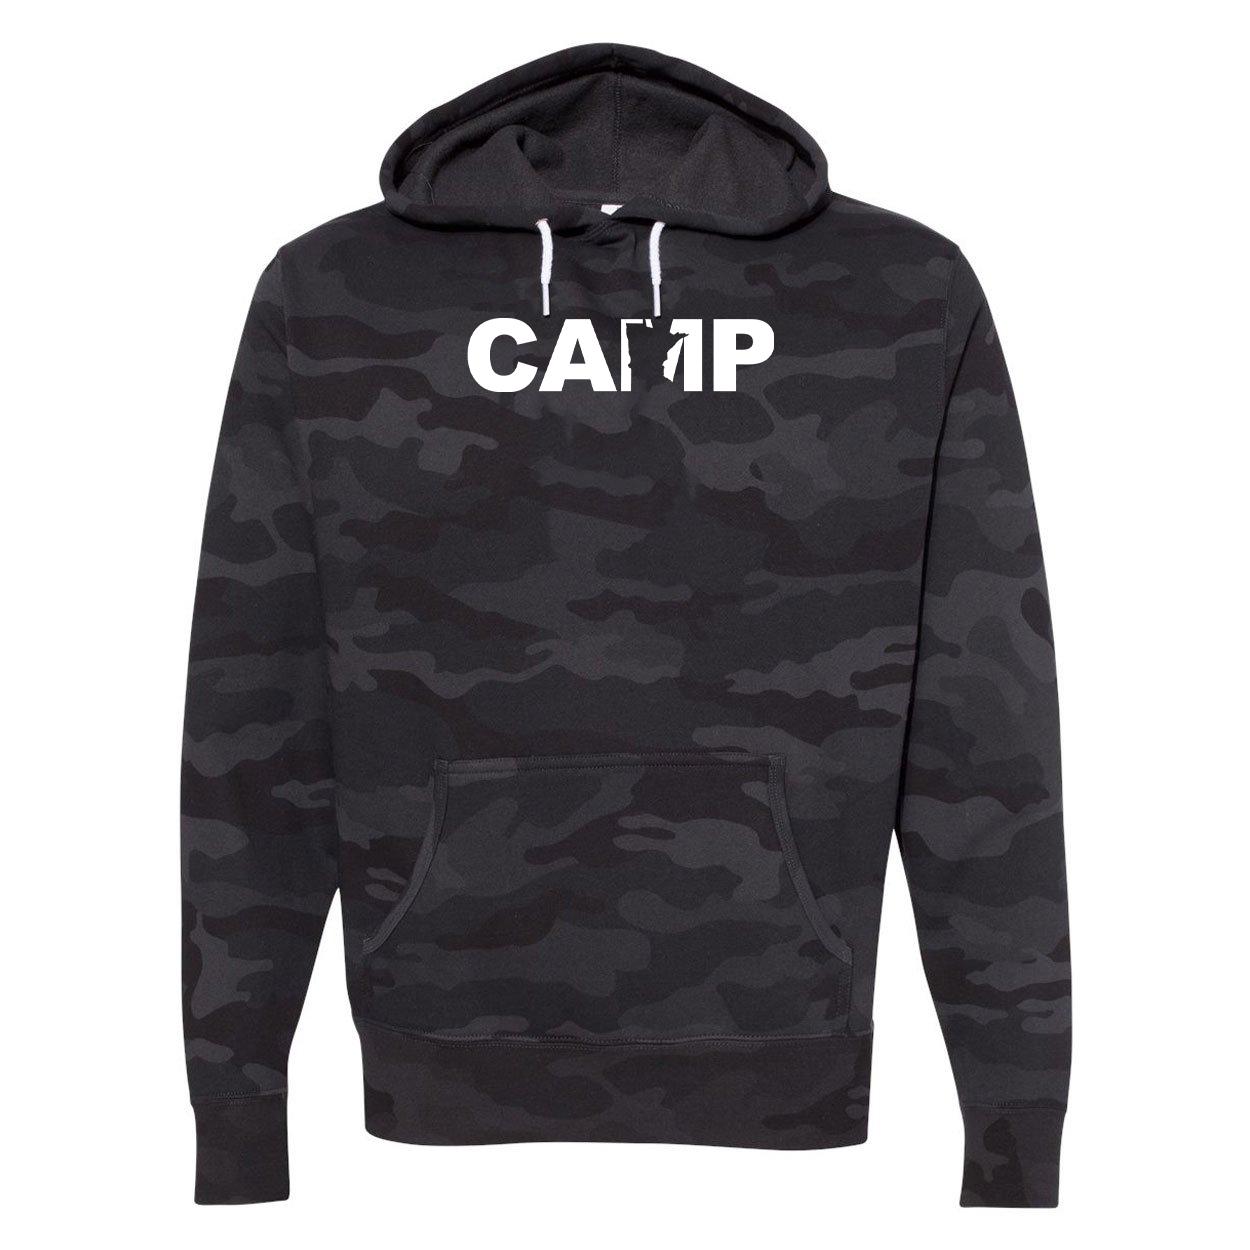 Camp Minnesota Classic Unisex Hooded Sweatshirt Black Camo (White Logo)